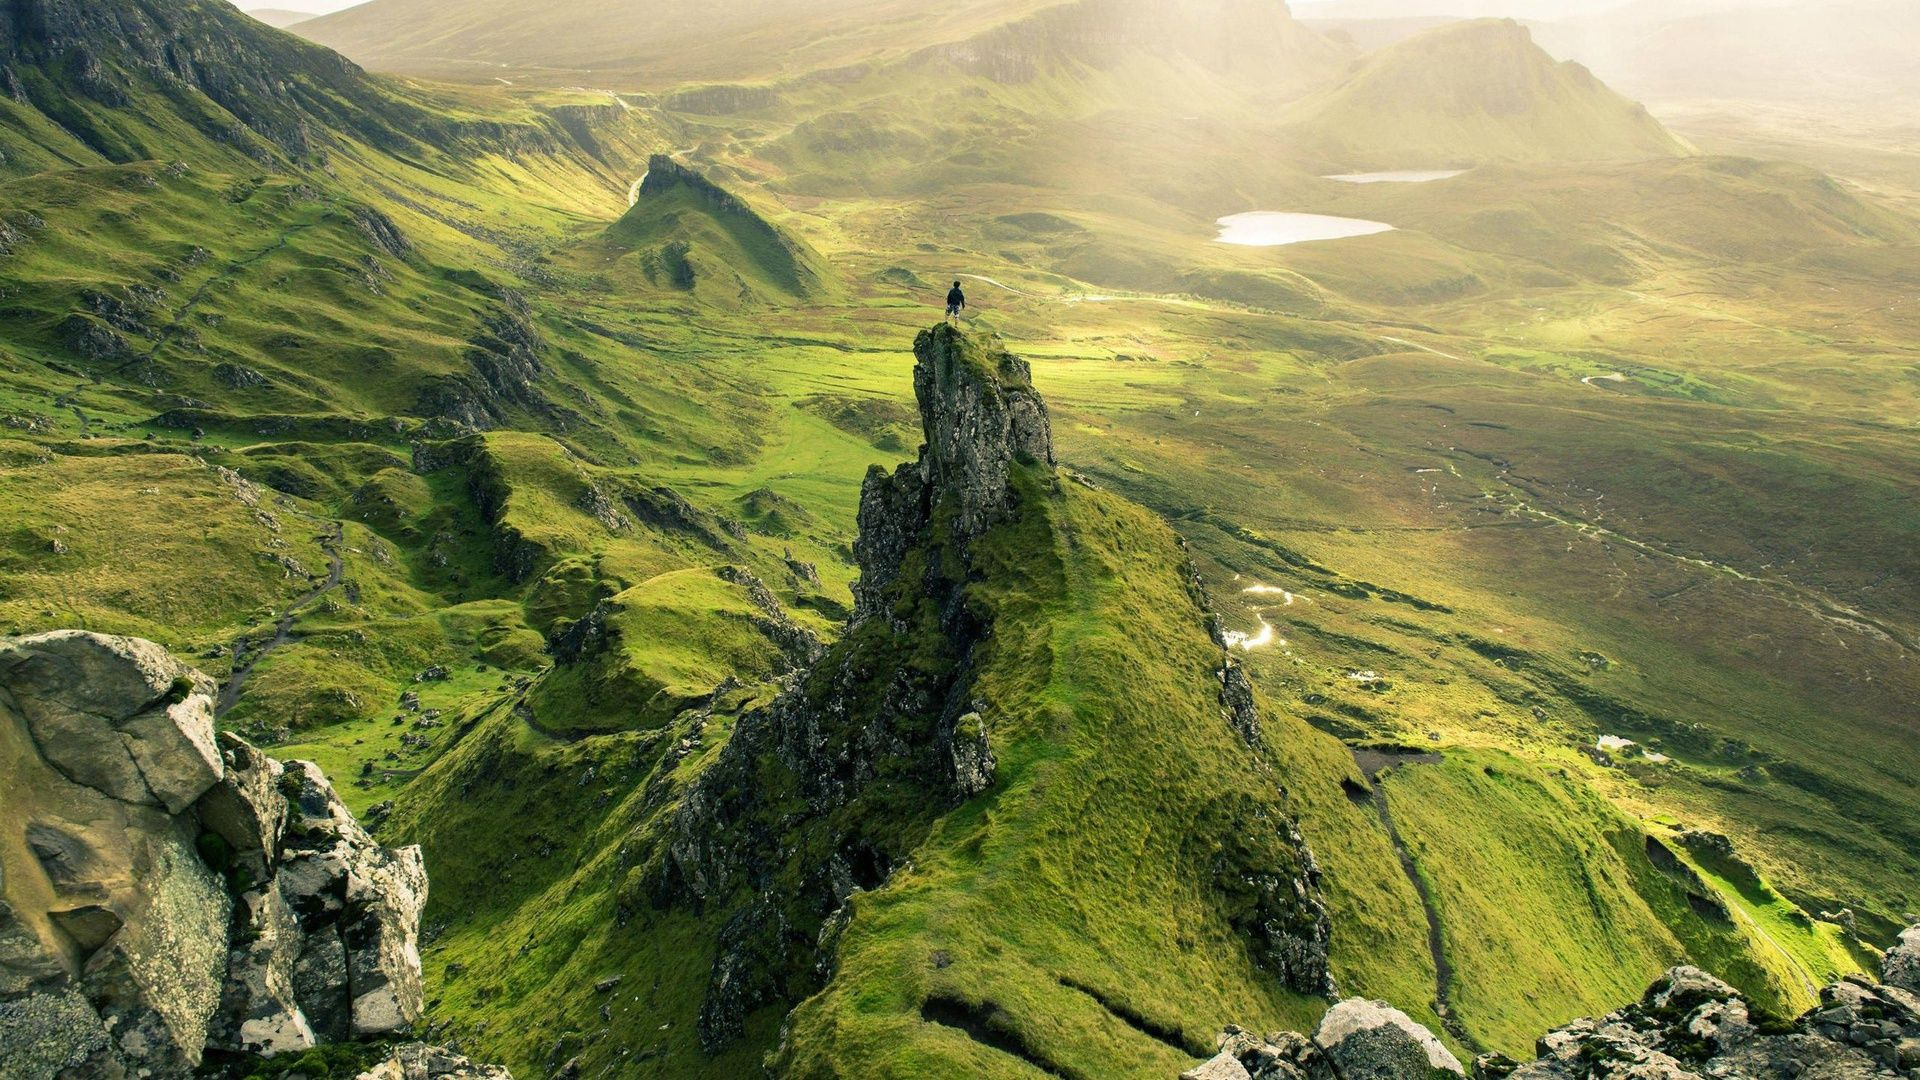 1920x1080 Isle Of Skye Peak Scotland Desktop Pc And Mac Wallpaper Scotland Wallpaper Isle Of Skye Scenery Wallpaper